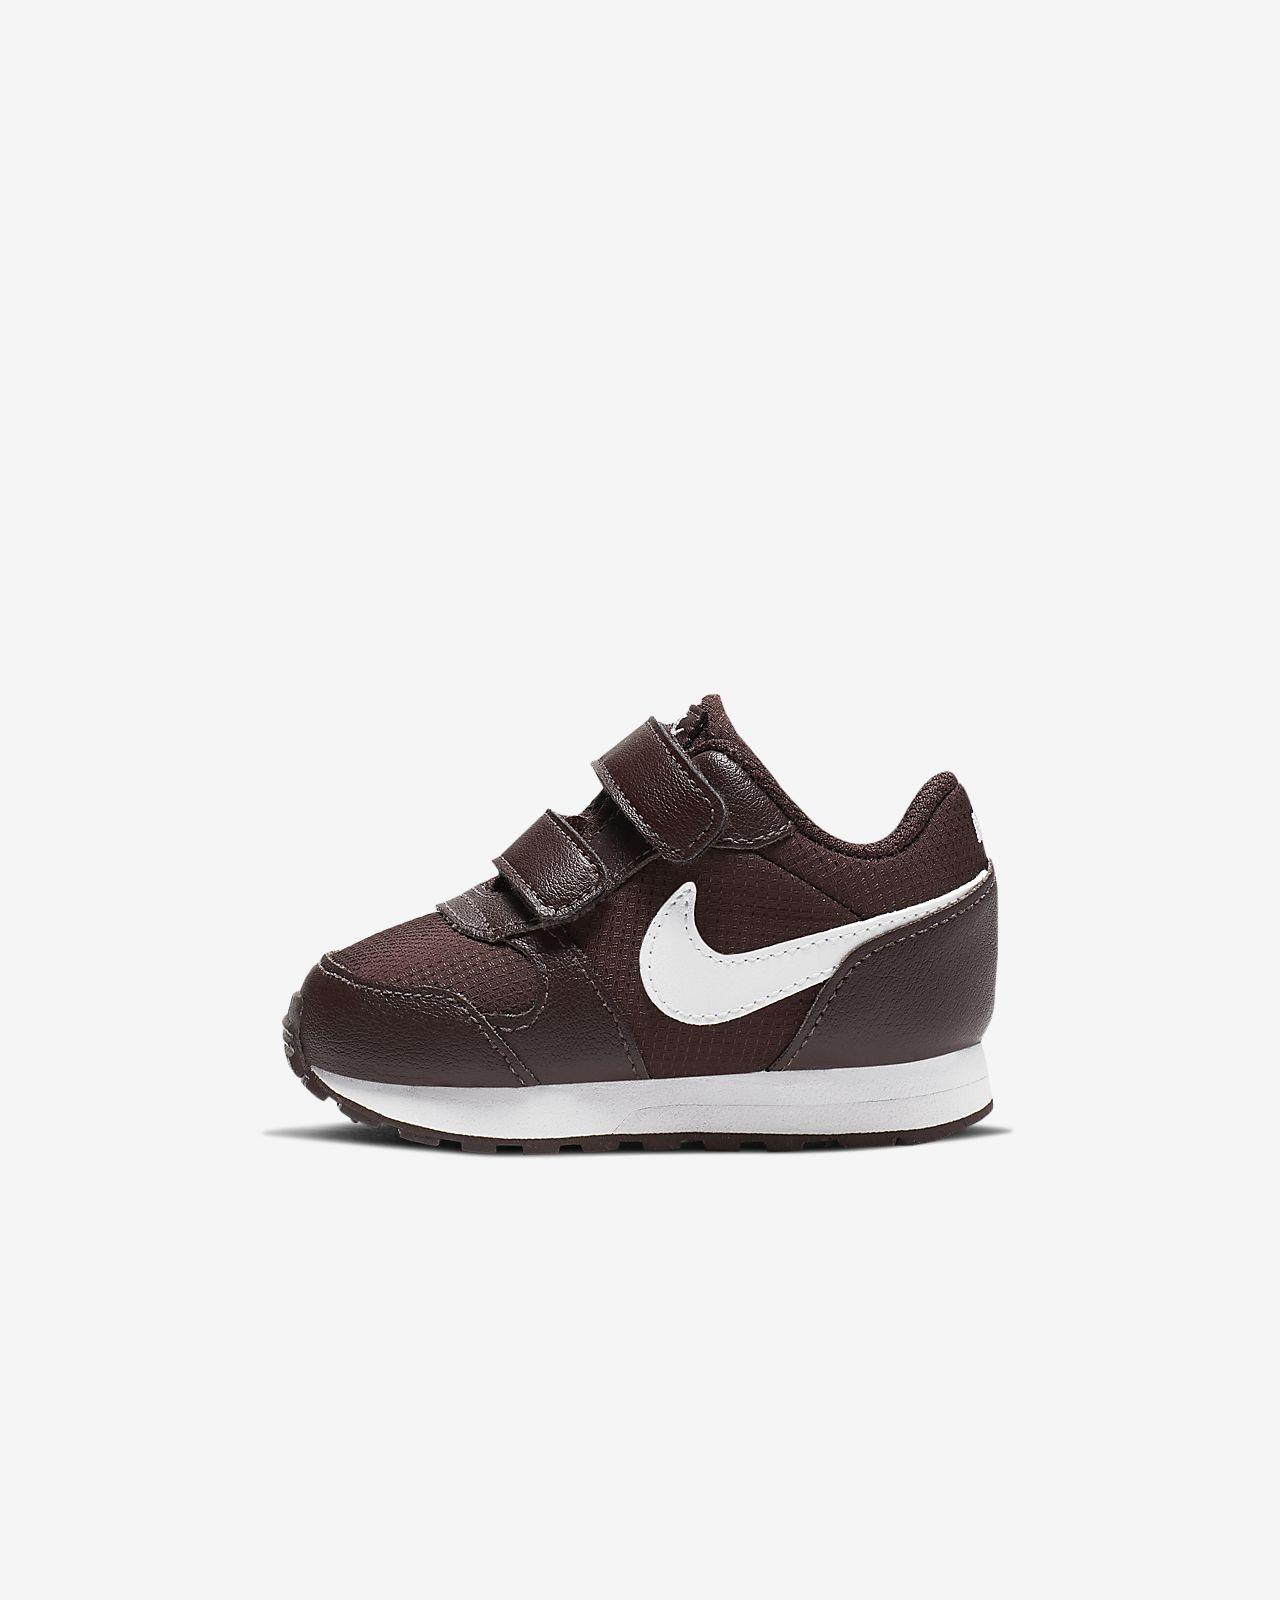 Buty dla niemowląt Nike MD Runner 2 PE